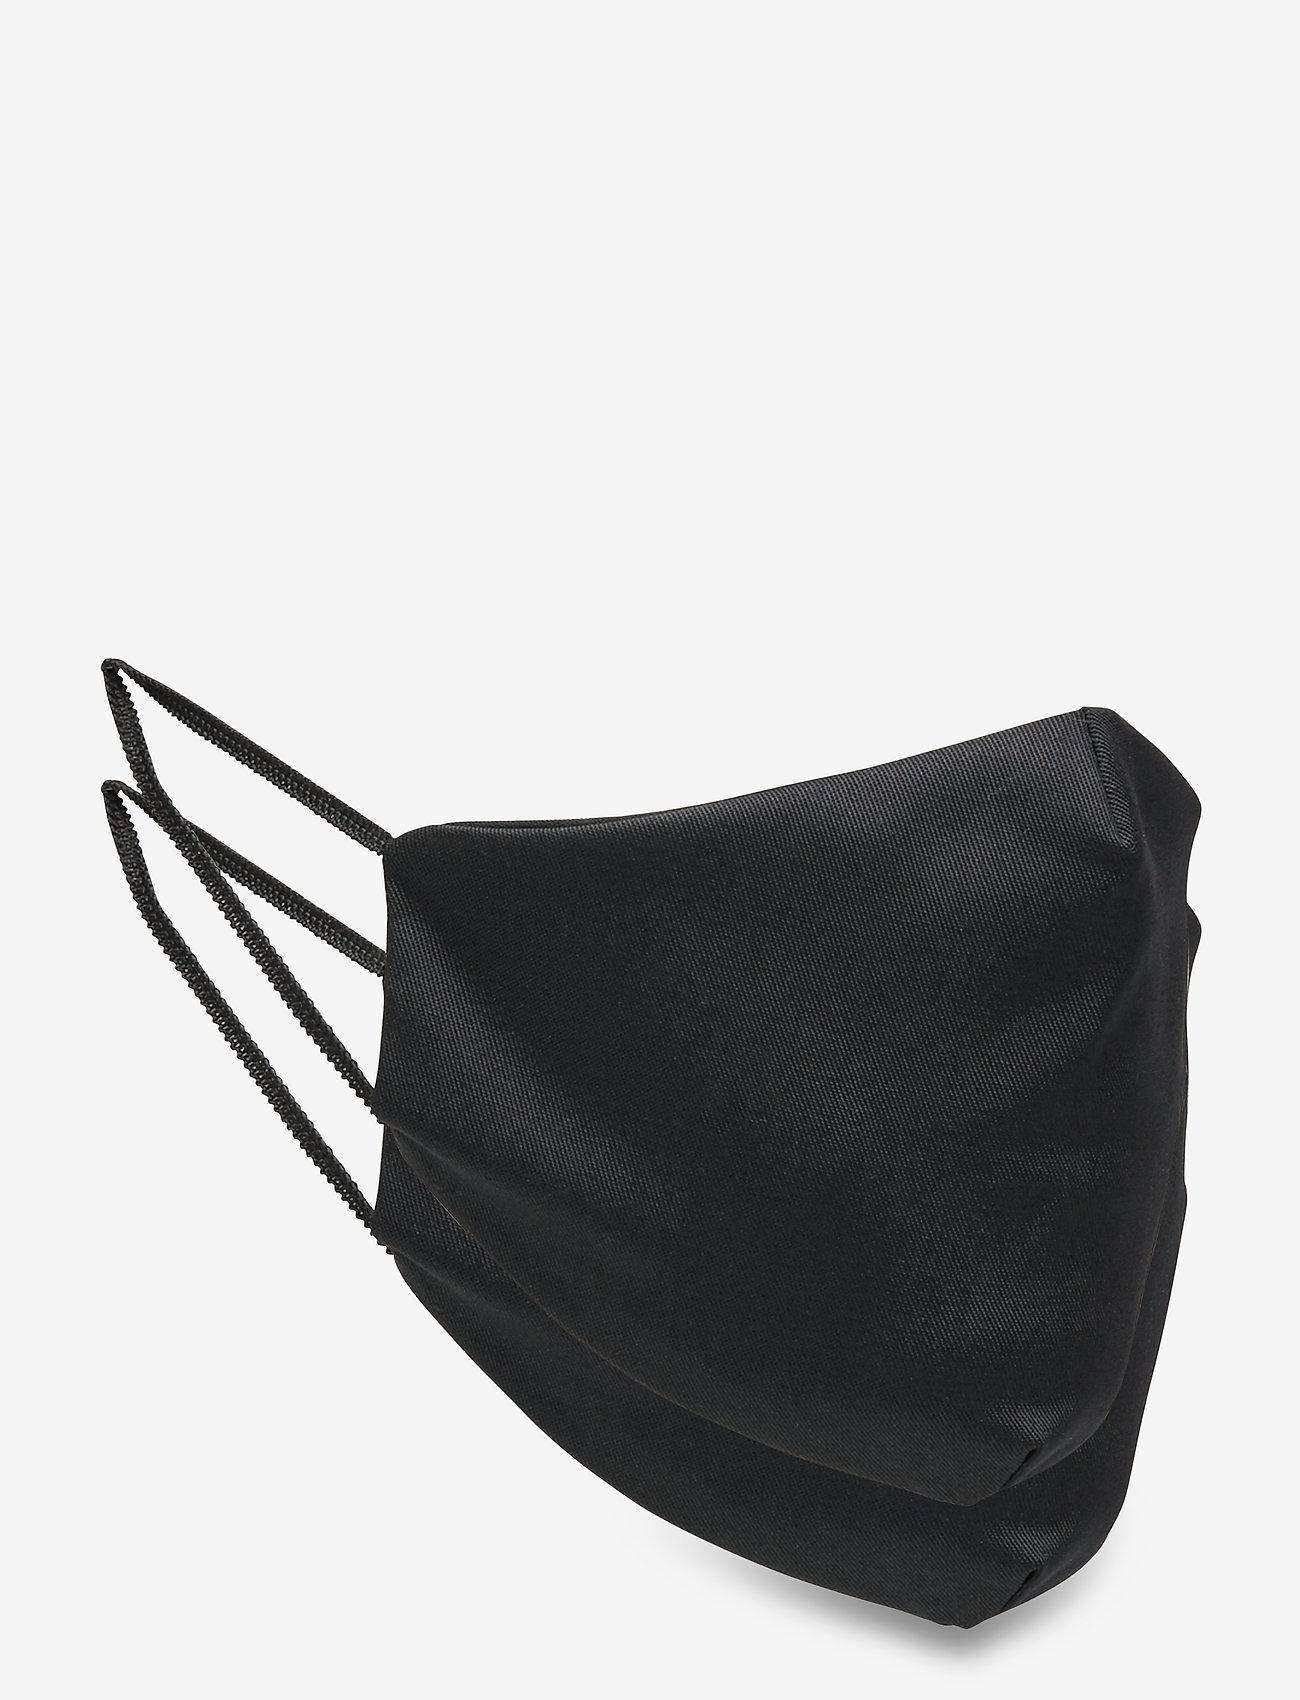 ORAS24 - Reusable face mask,2 pack, Kids 2-10 - maski na twarz - black - 1